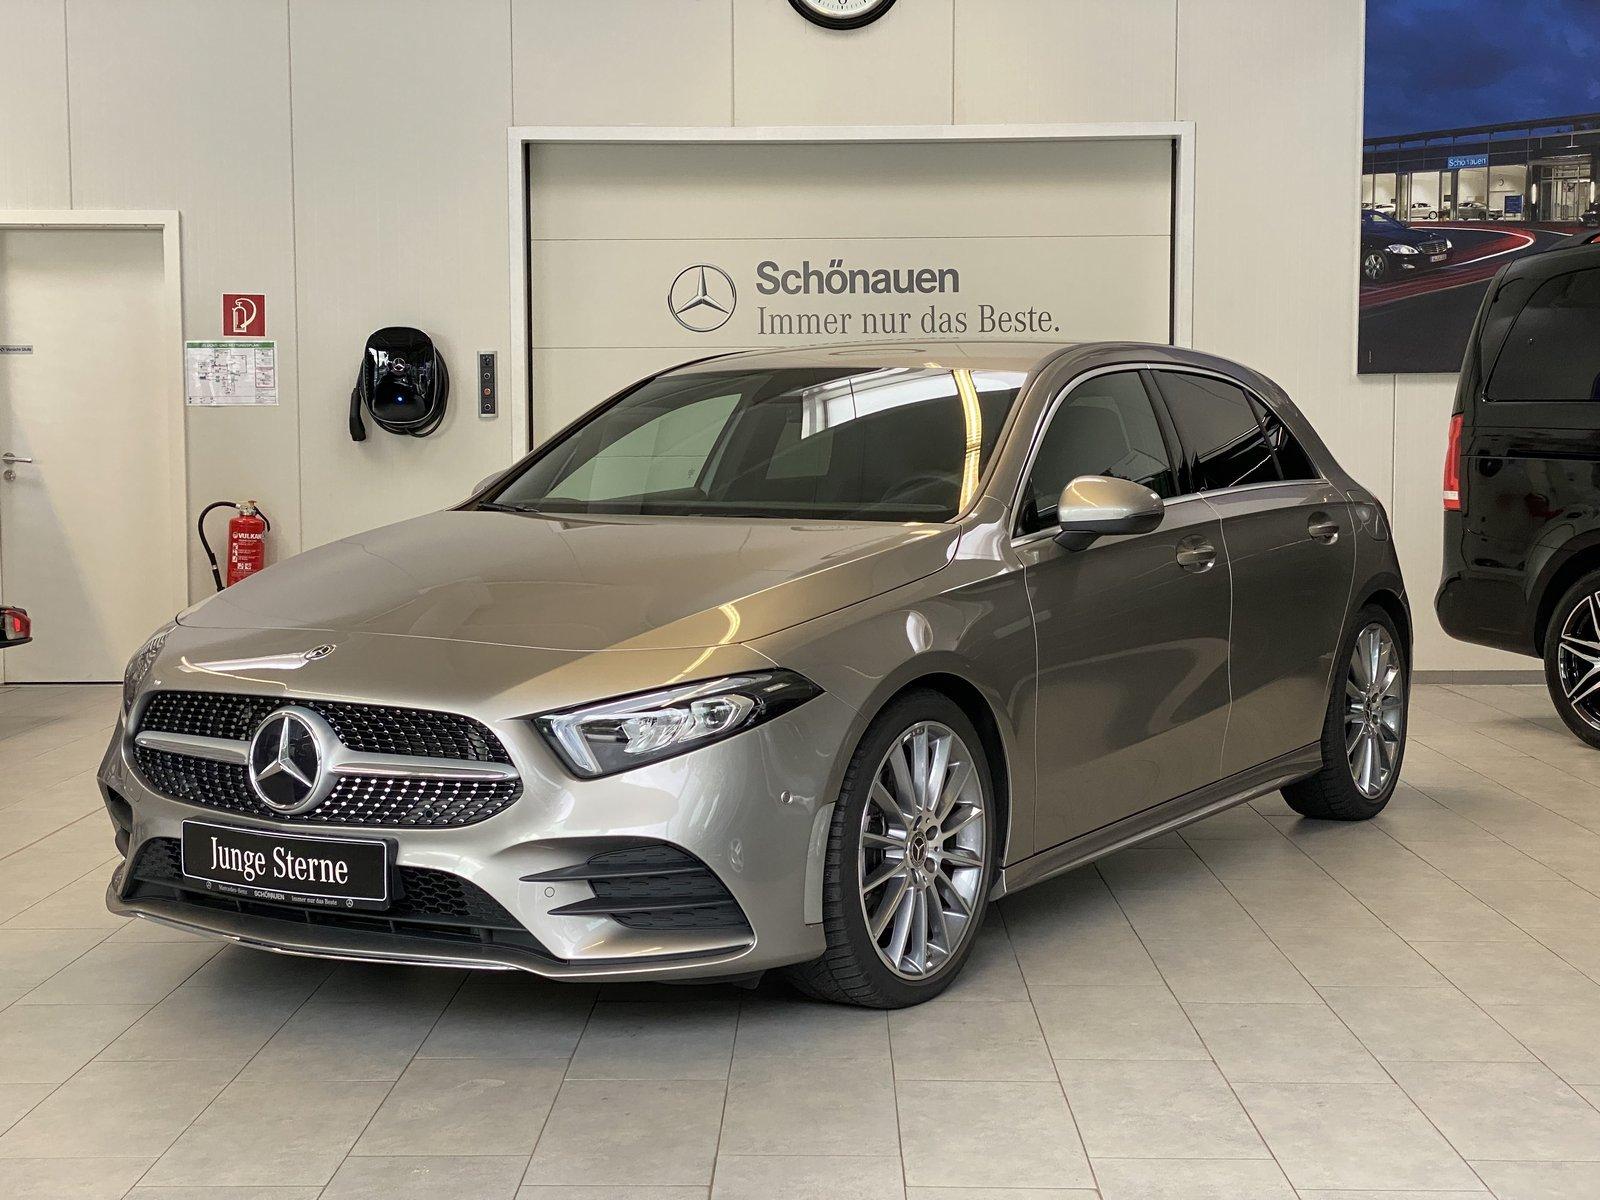 Mercedes-Benz A 220 AMG+NAVI-PREMIUM+LED+MBUX+SPIEGEL-PKT+KEYL, Jahr 2019, Benzin